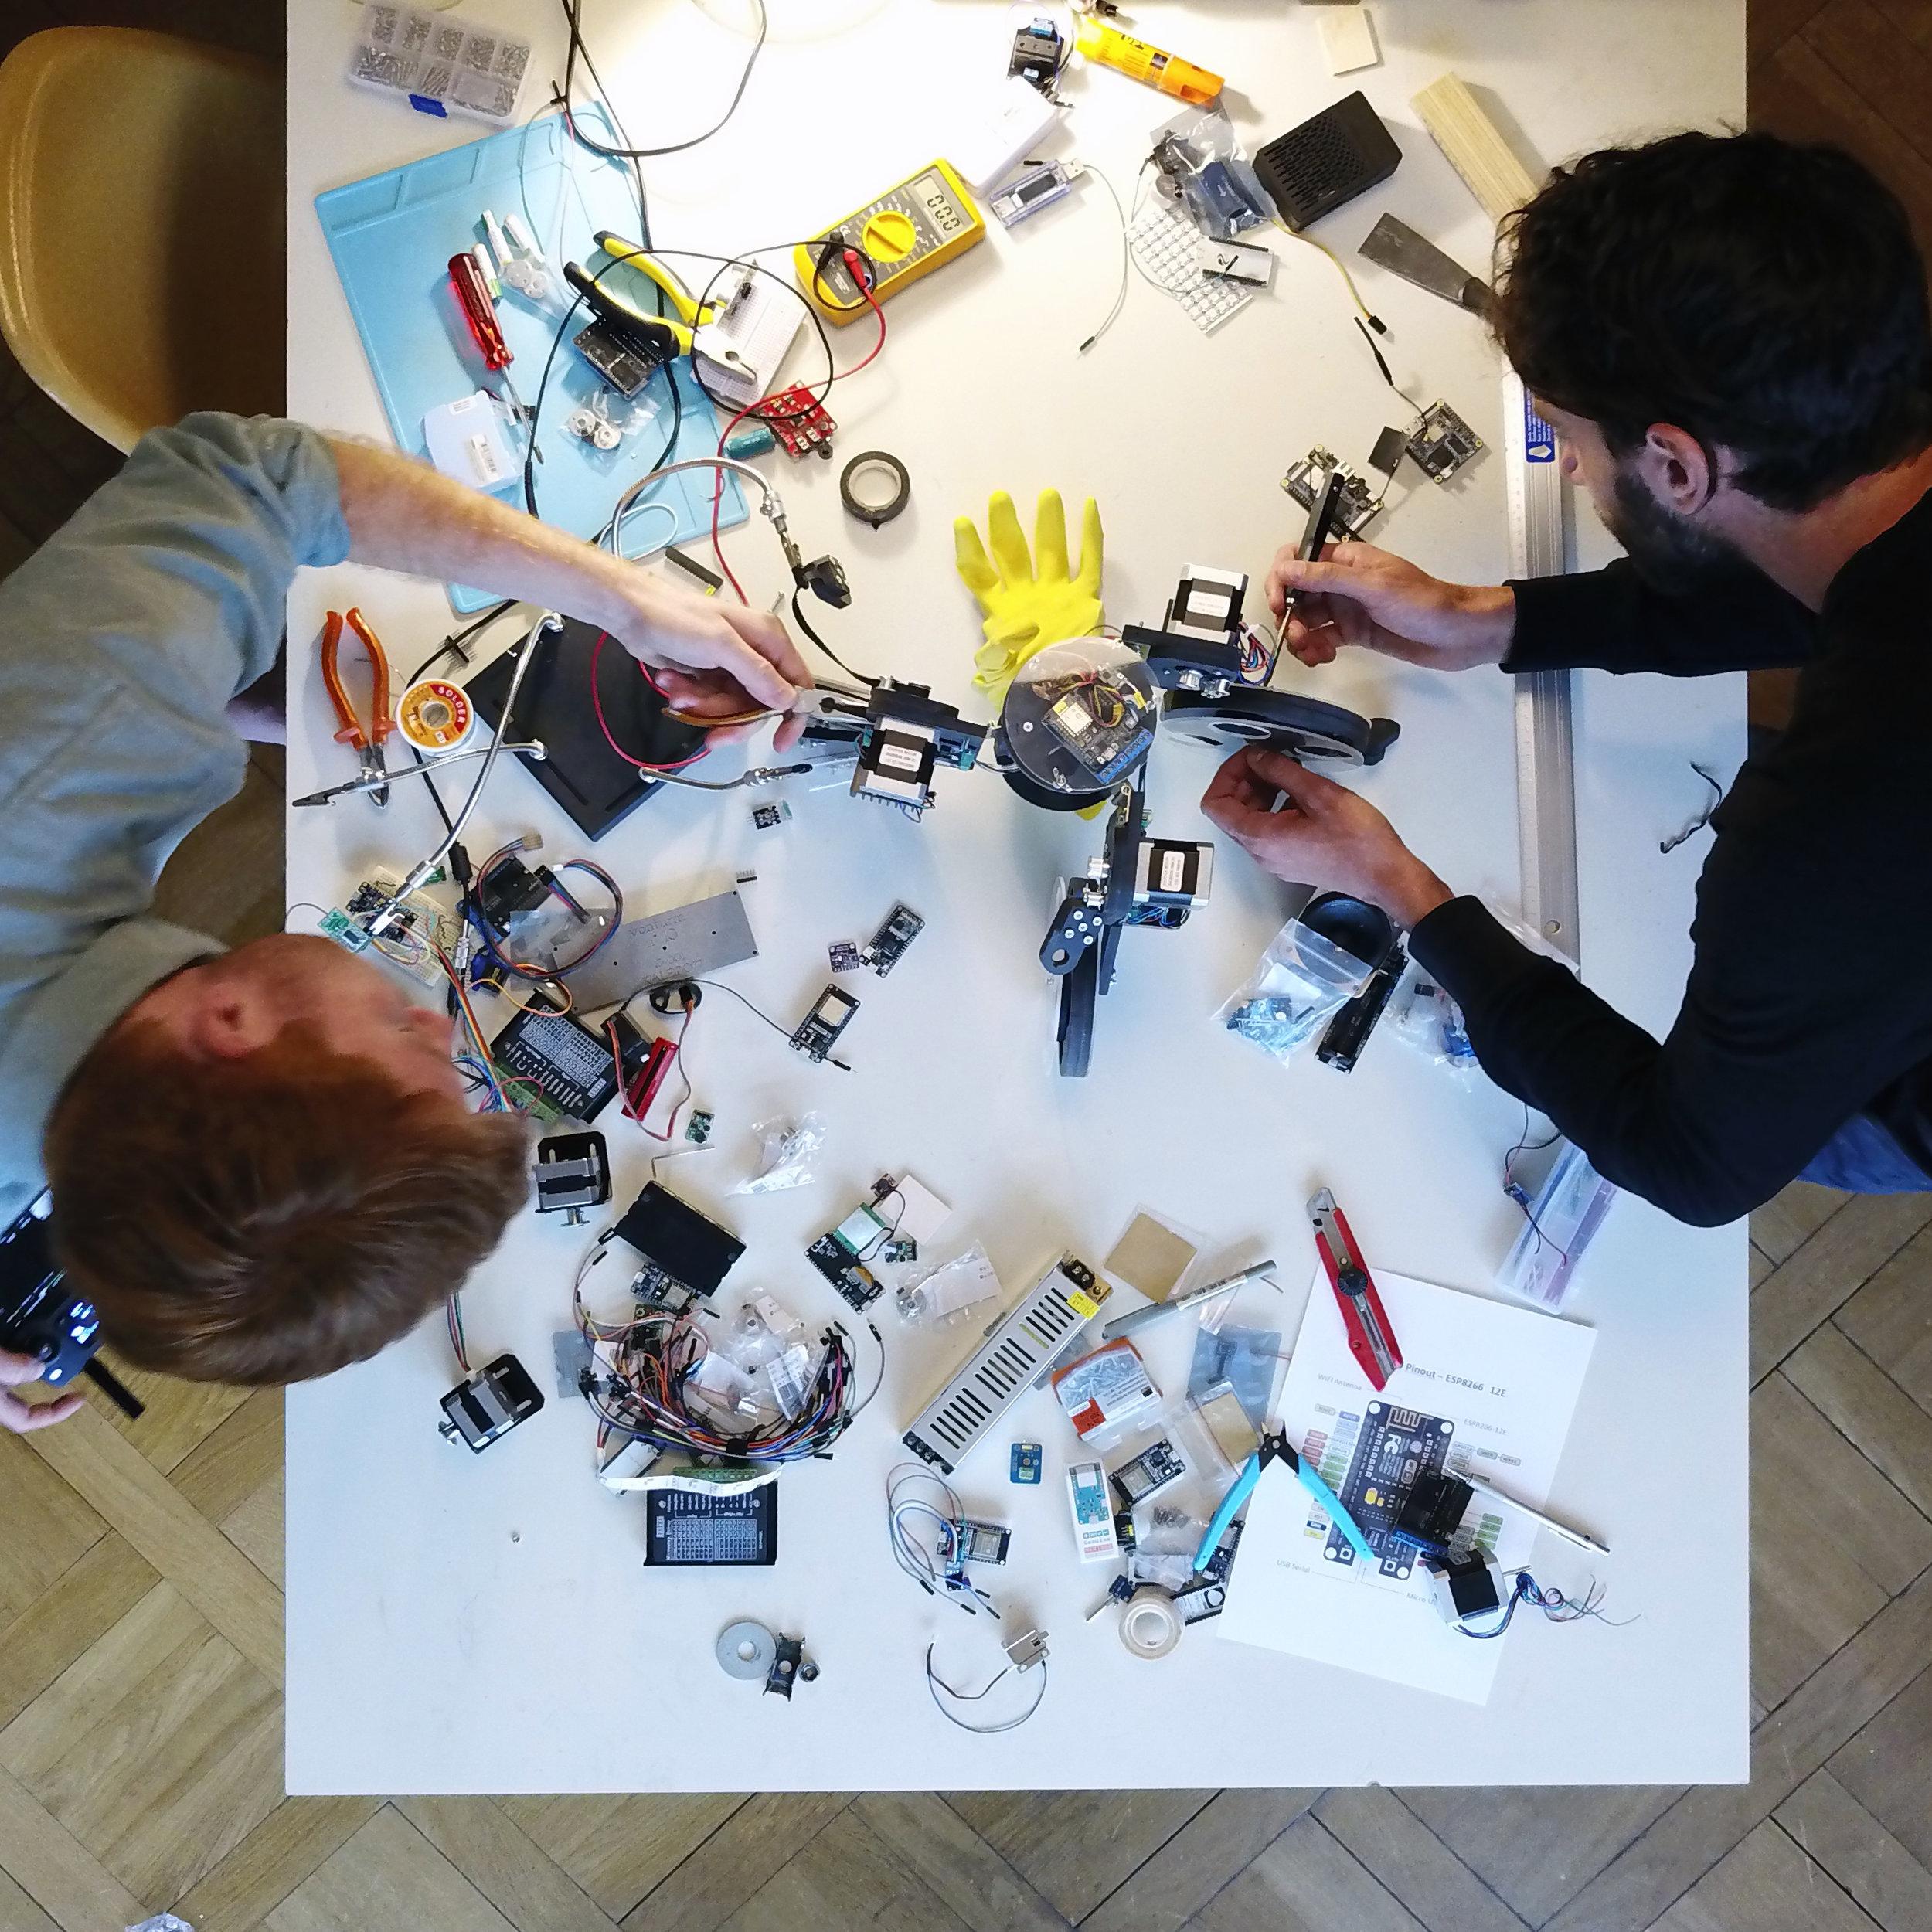 The construction of the  Ungenaubot , 2018. Photograph by Ilmar Hurkxkens and Fabian Bircher